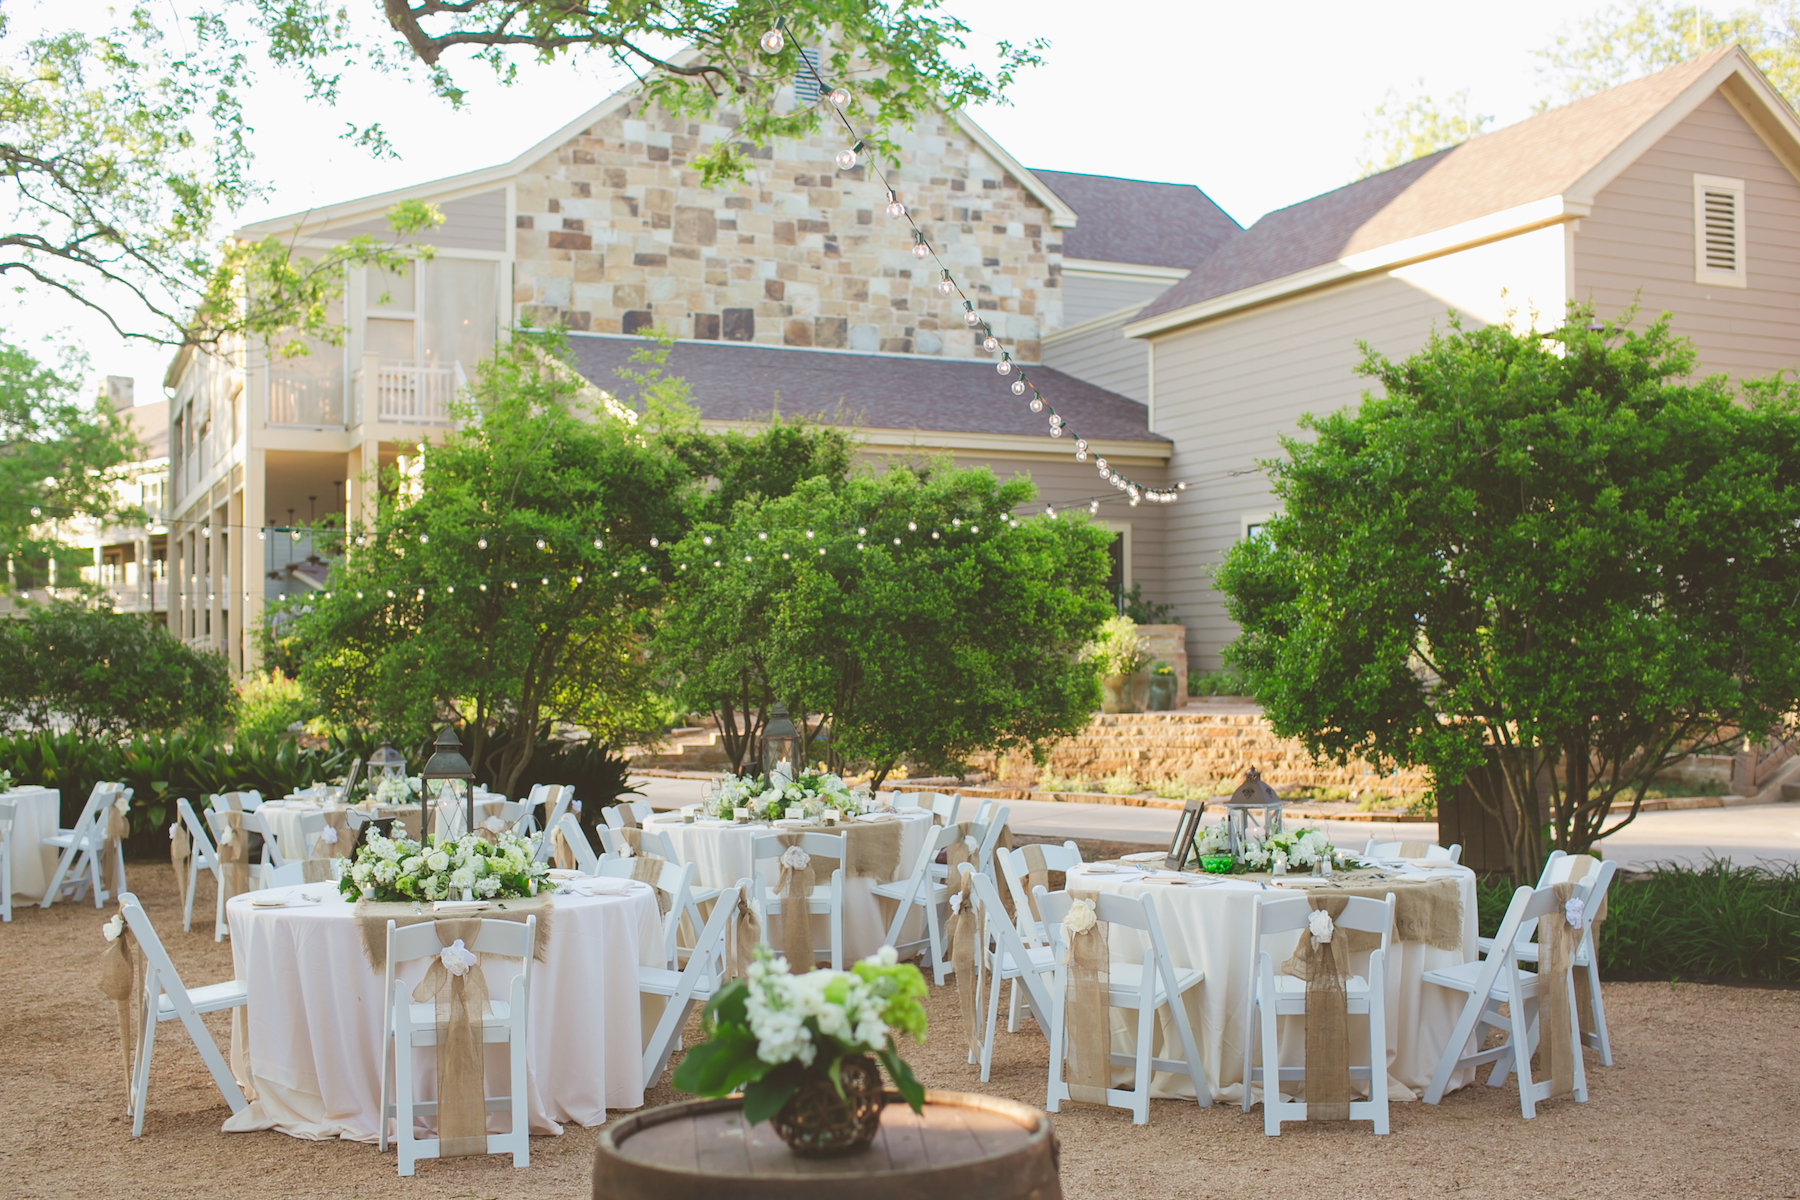 hyatt-lost-pines-wedding-renee-and-adam-0386